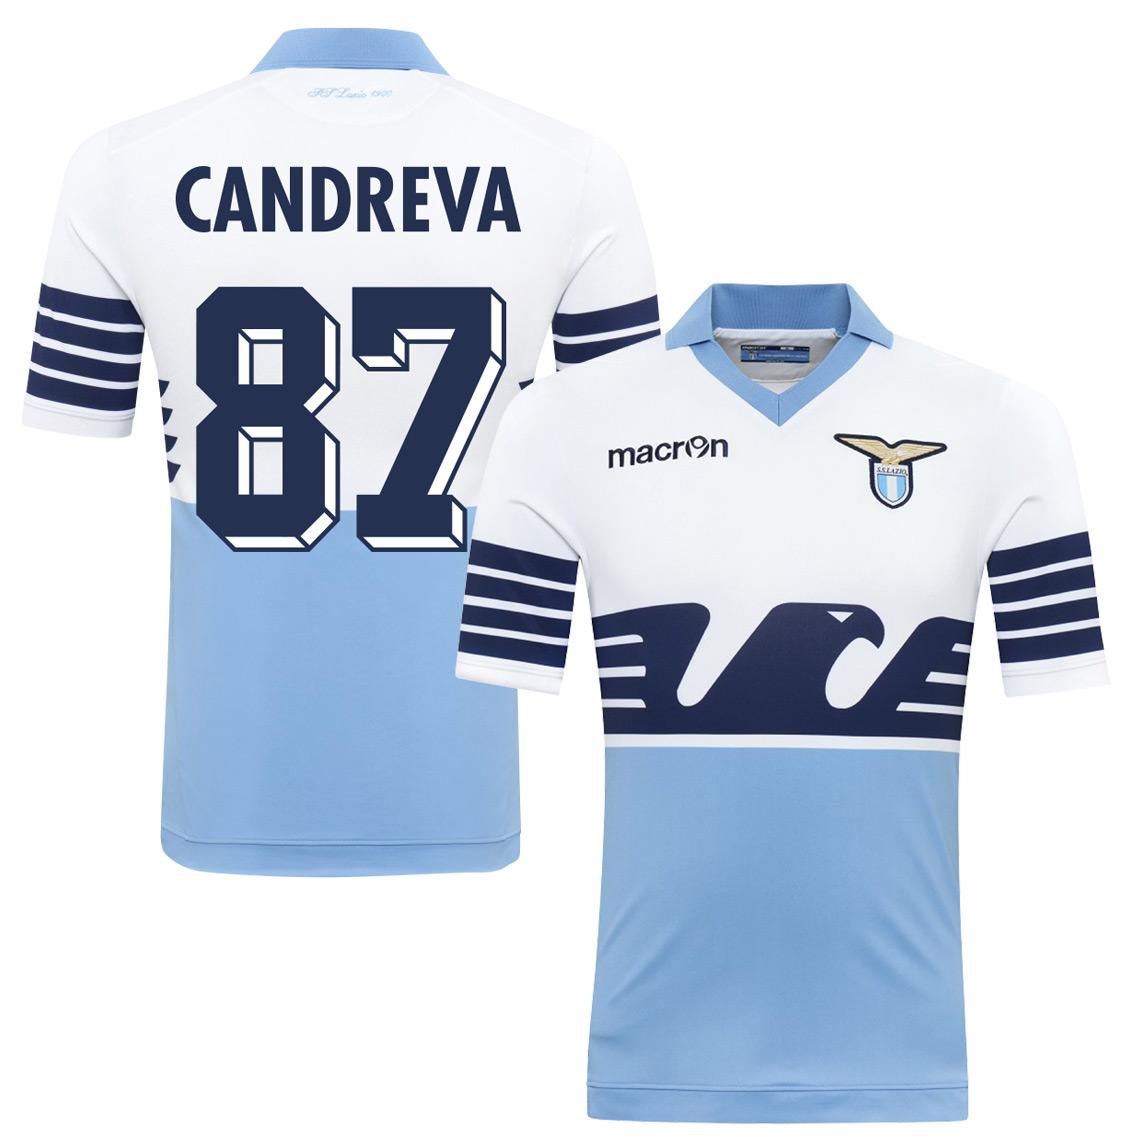 2015 Lazio 115 Year Candreva Jersey (Fan Style Printing) - M